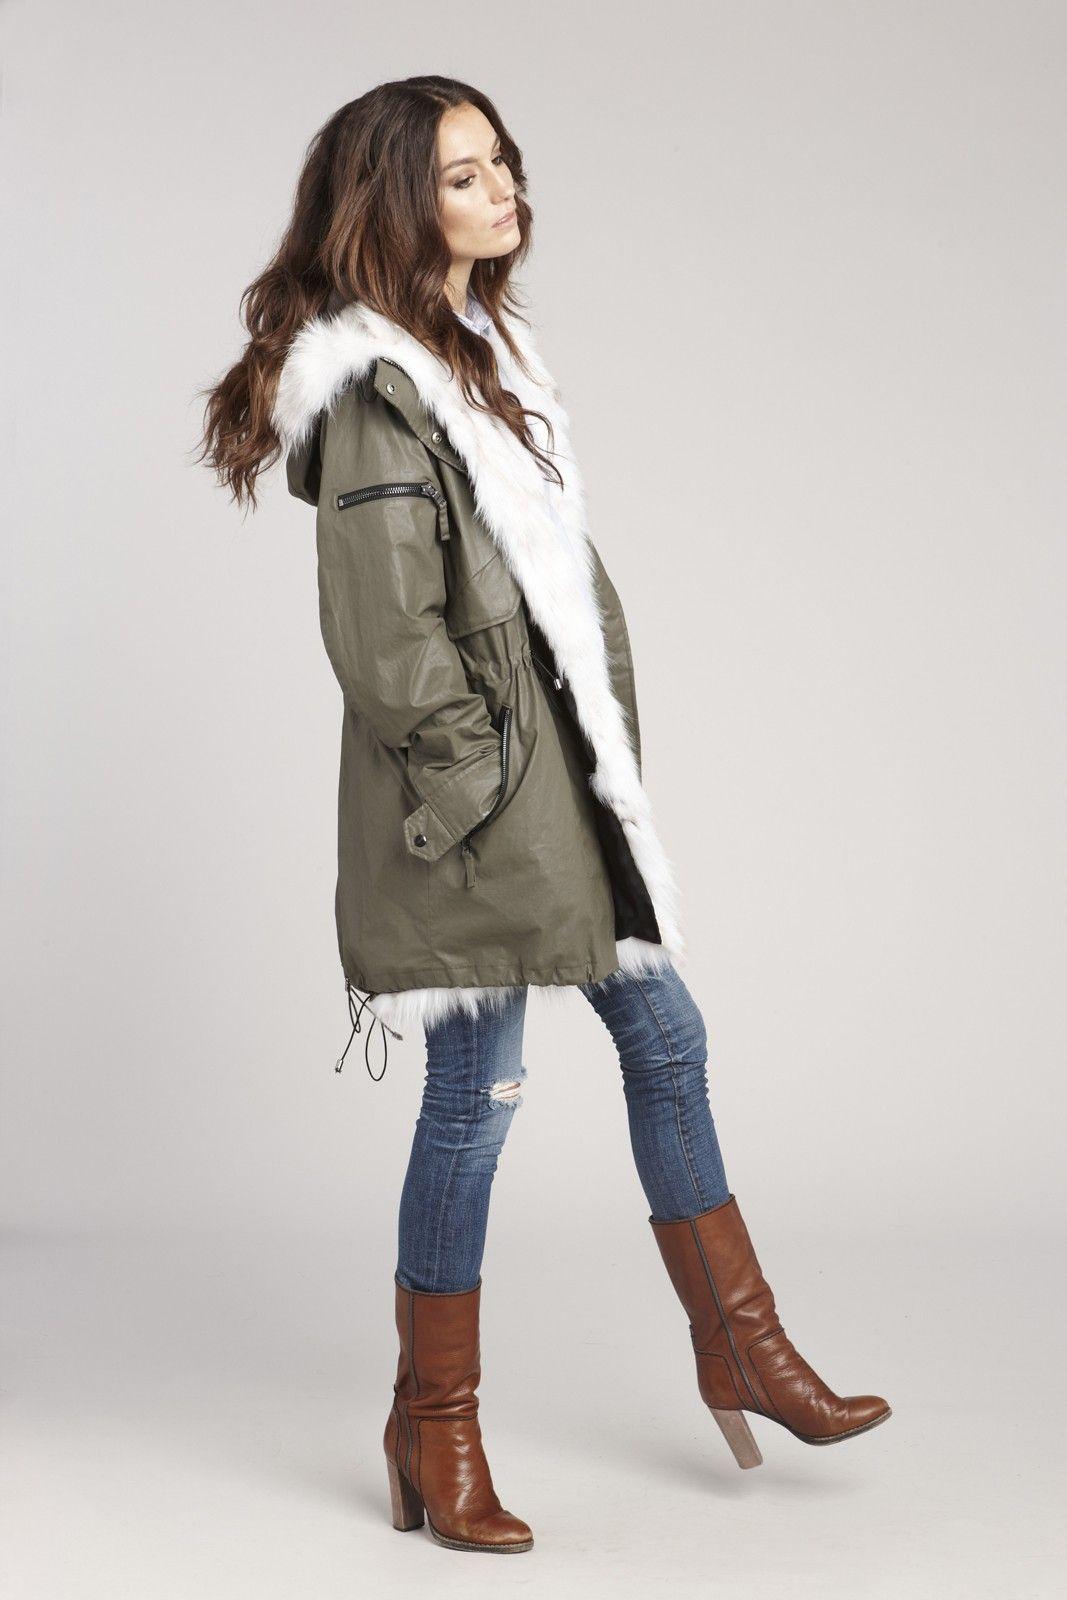 Sam New York Modern Outerwear Collection By Andrew Marc Schwartz Winter Coats Winter Jacket Sam C Winter Jackets Autumn Winter Fashion Coats For Women [ 1600 x 1067 Pixel ]